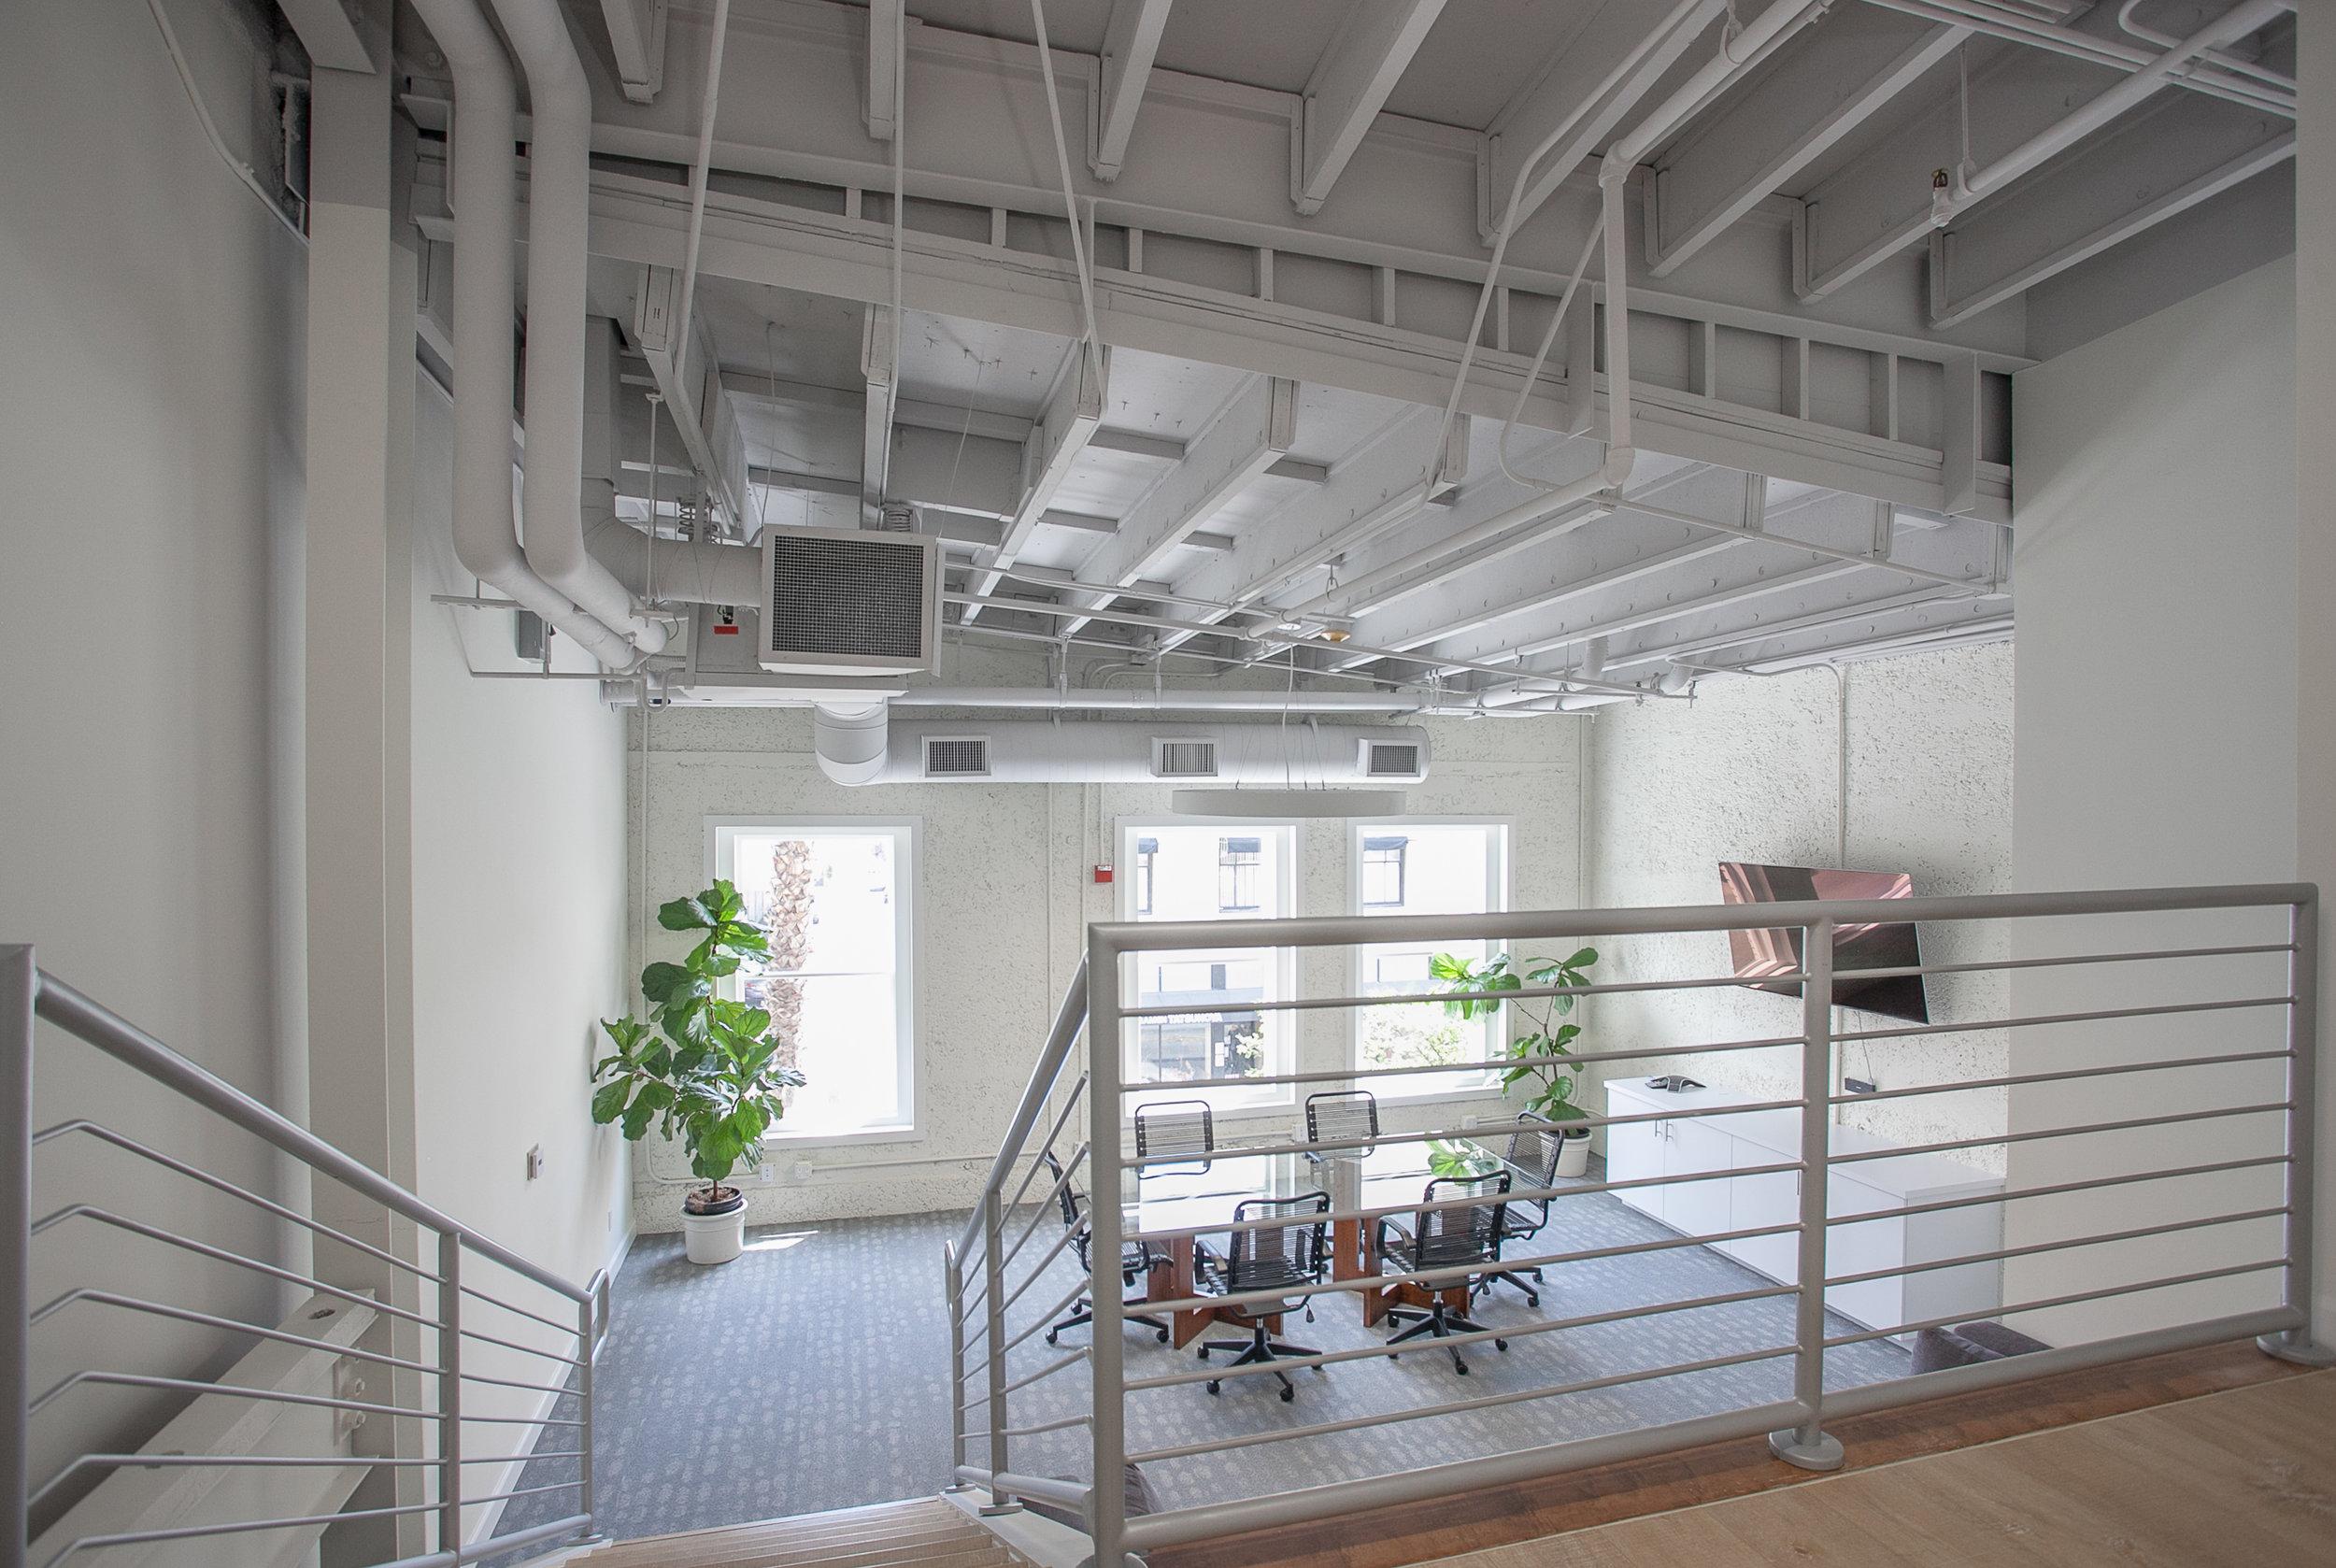 Union St, Pasadena_Admin Offices_PRINT-35.jpg